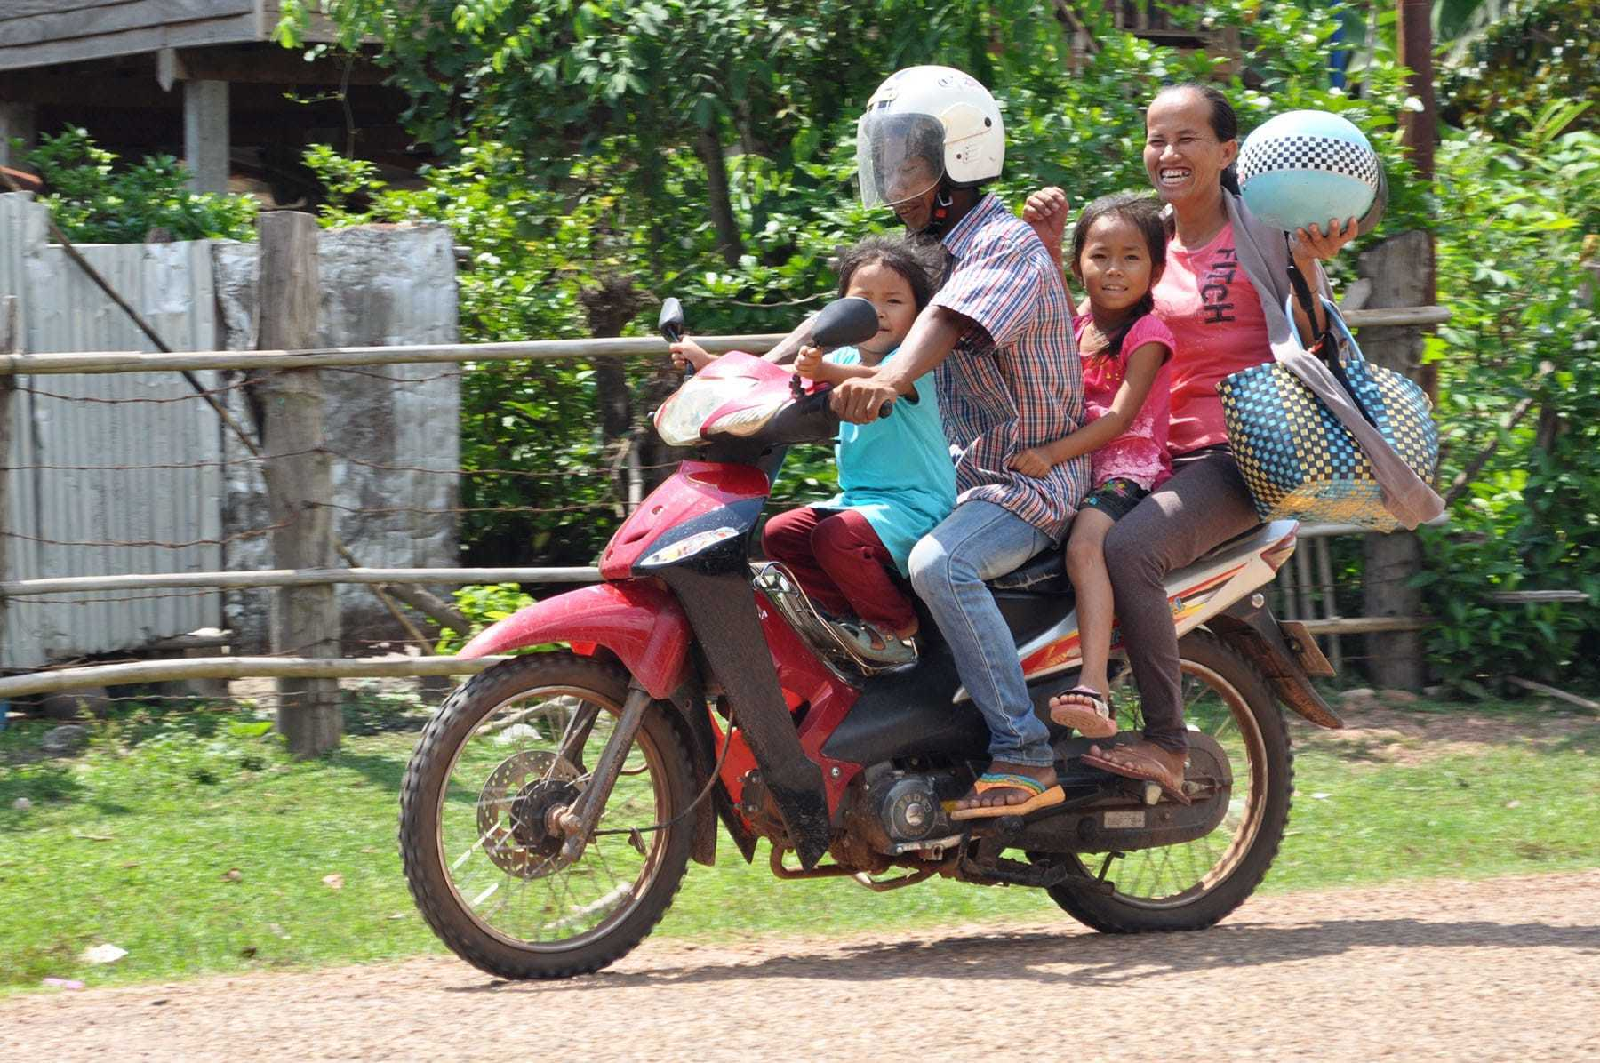 famille moto campagne laos